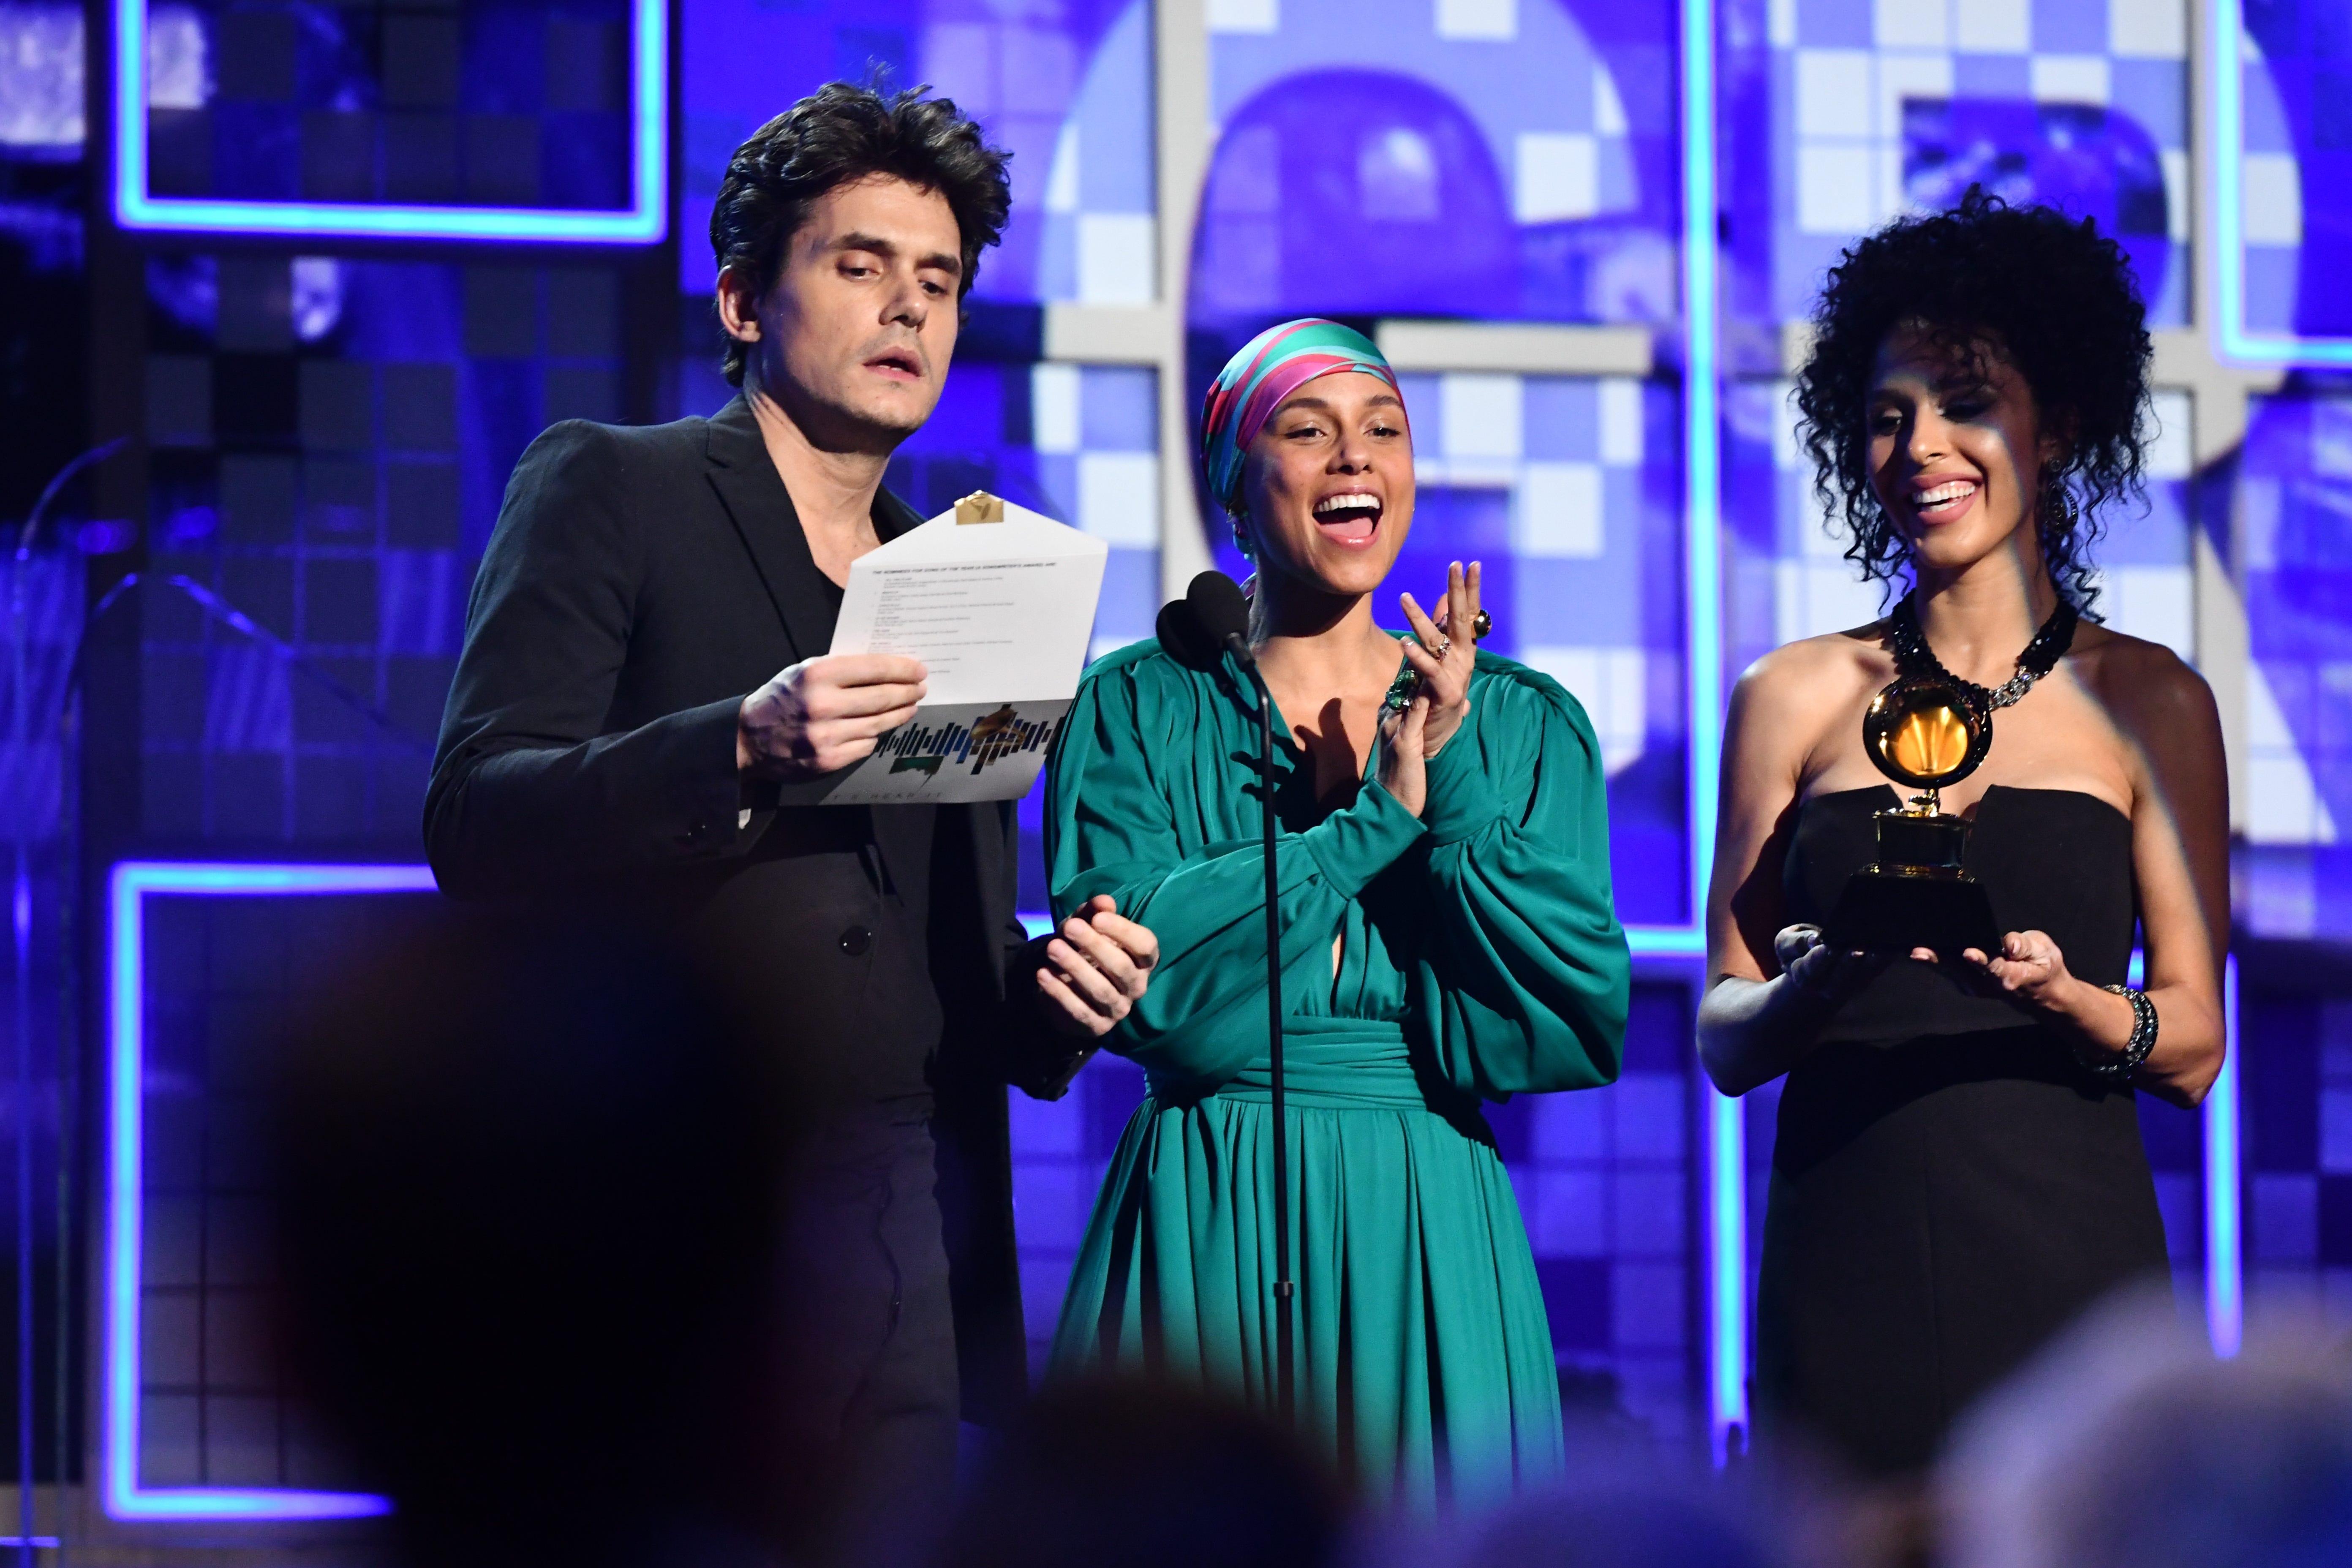 Alicia Keys wows social media with jaw-dropping Grammys medley